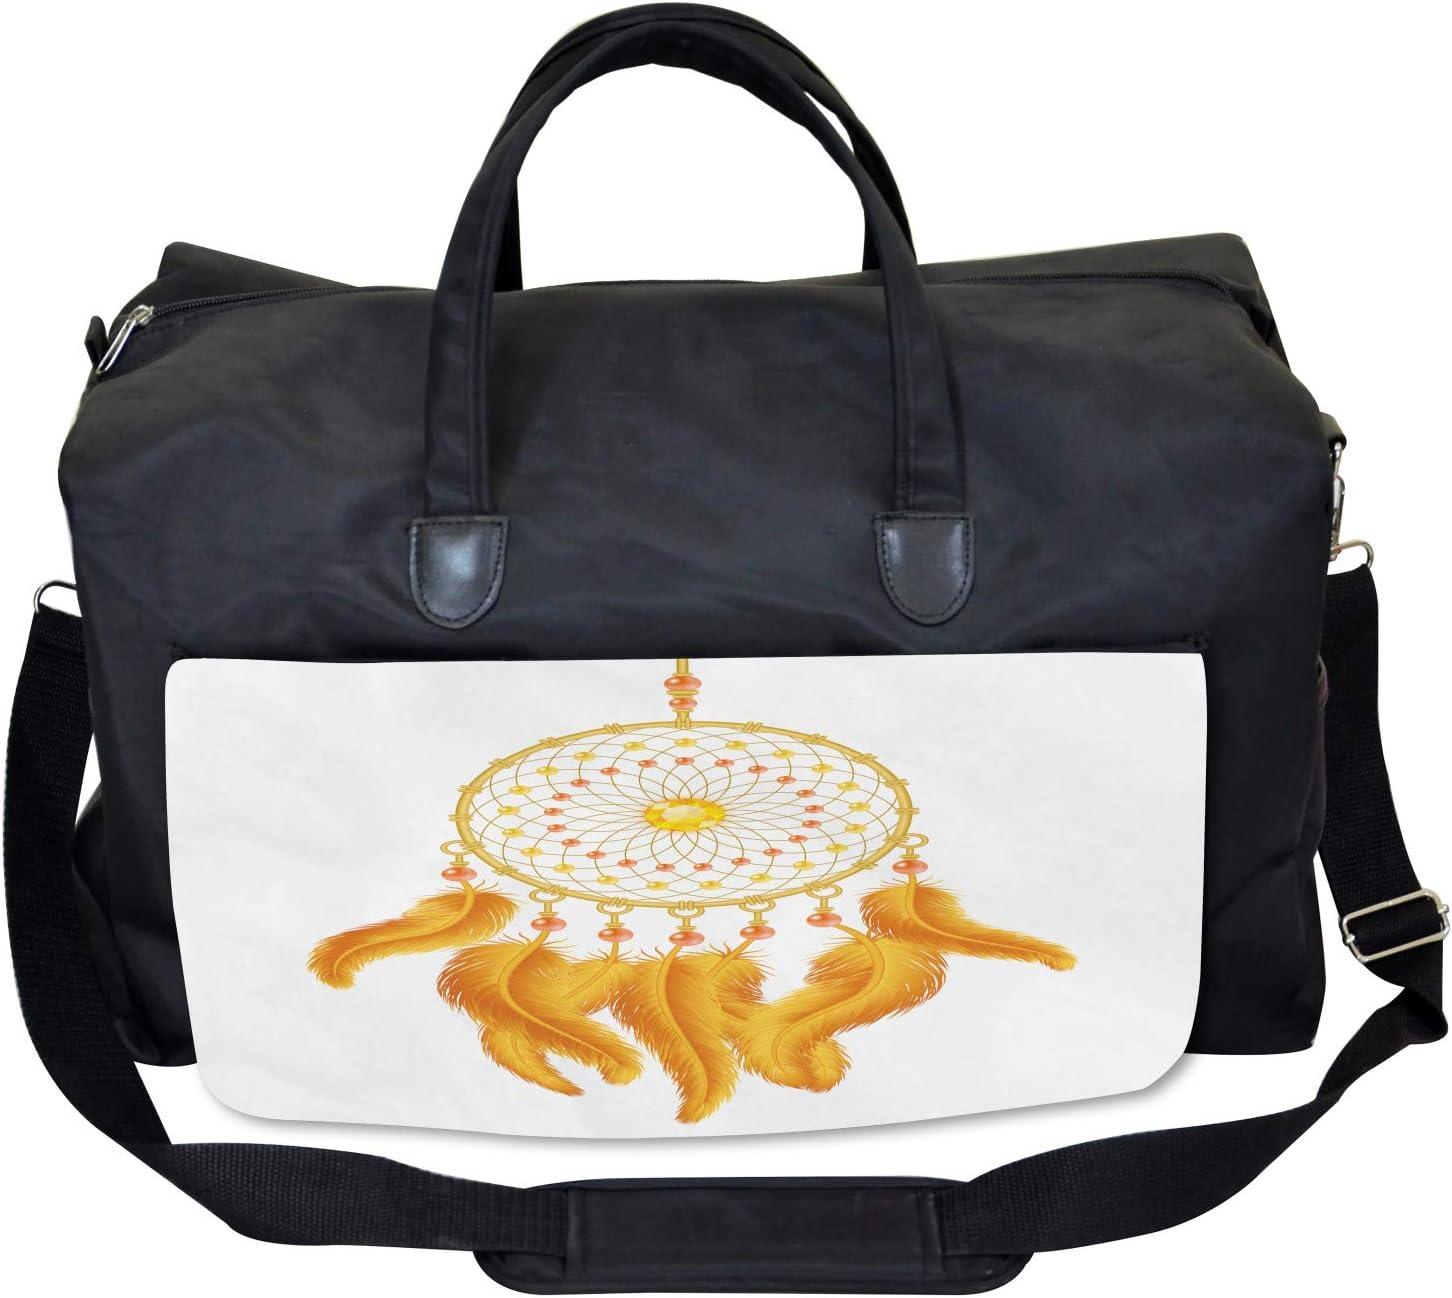 Ambesonne Aztec Gym Bag American Indigenous Large Weekender Carry-on